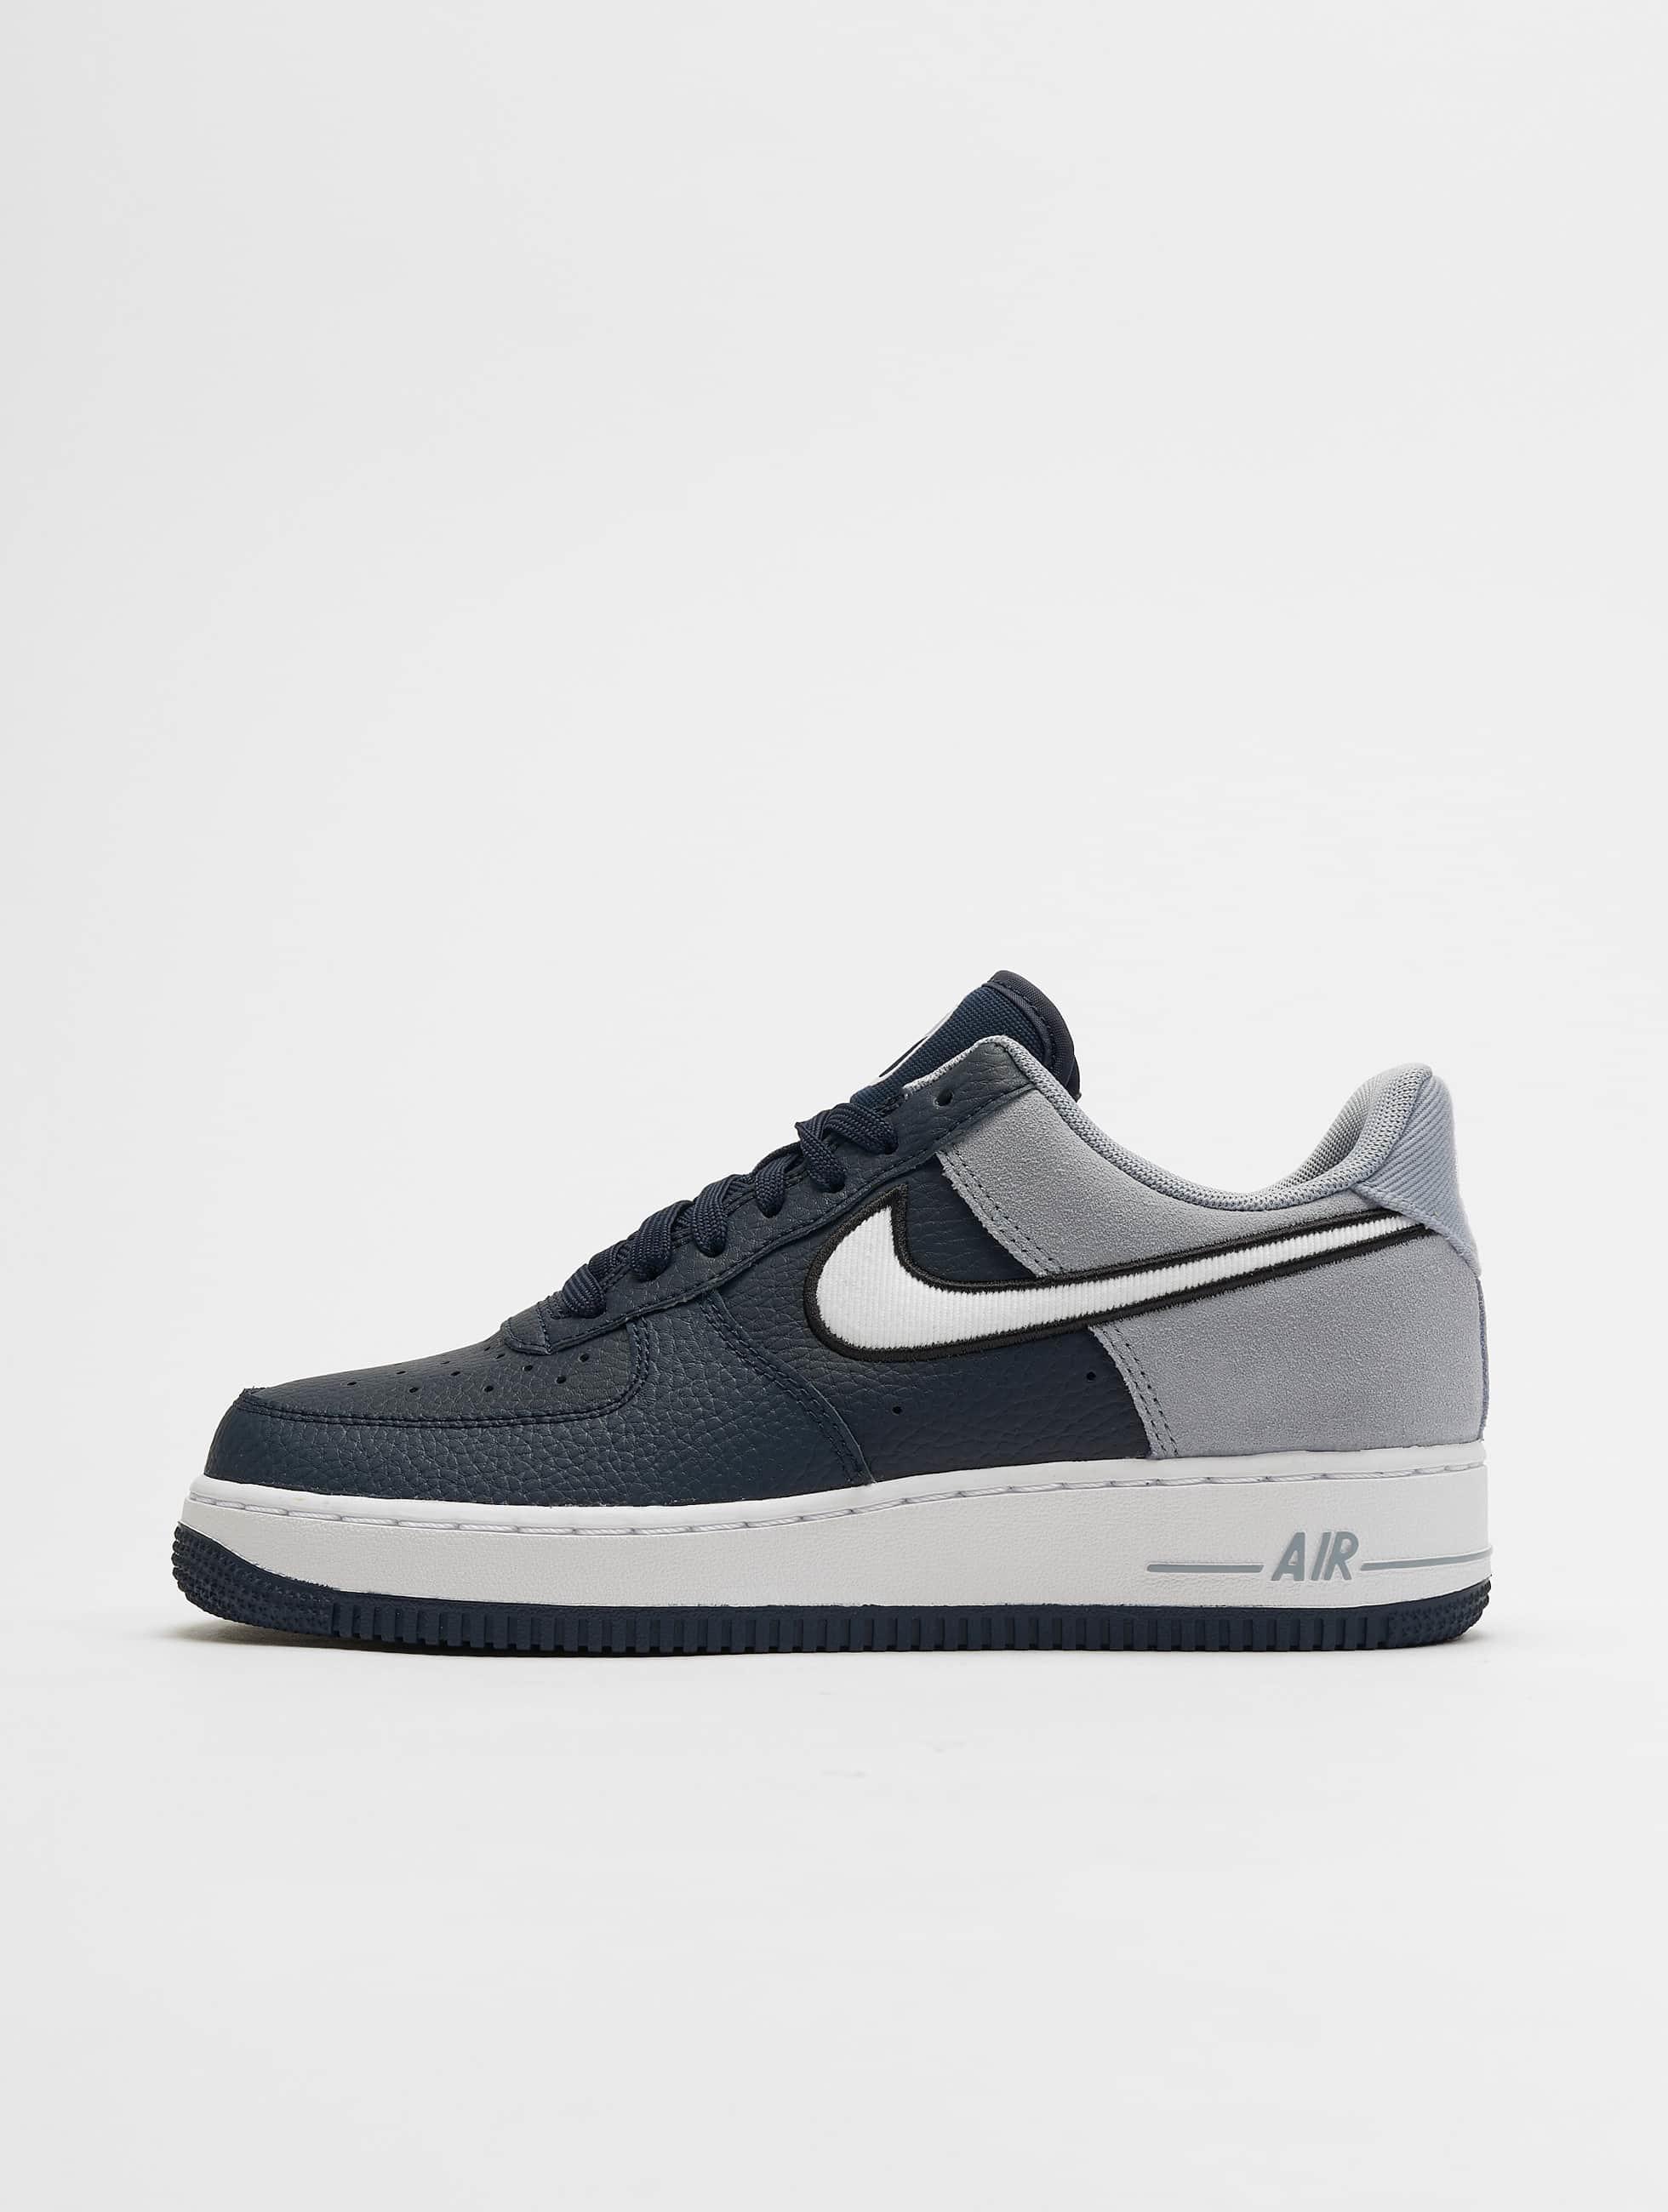 Lv8 Obsidianwhiteobsidian Mistblack Nike 1 Air Sneakers Force '07 3Rq45AjL